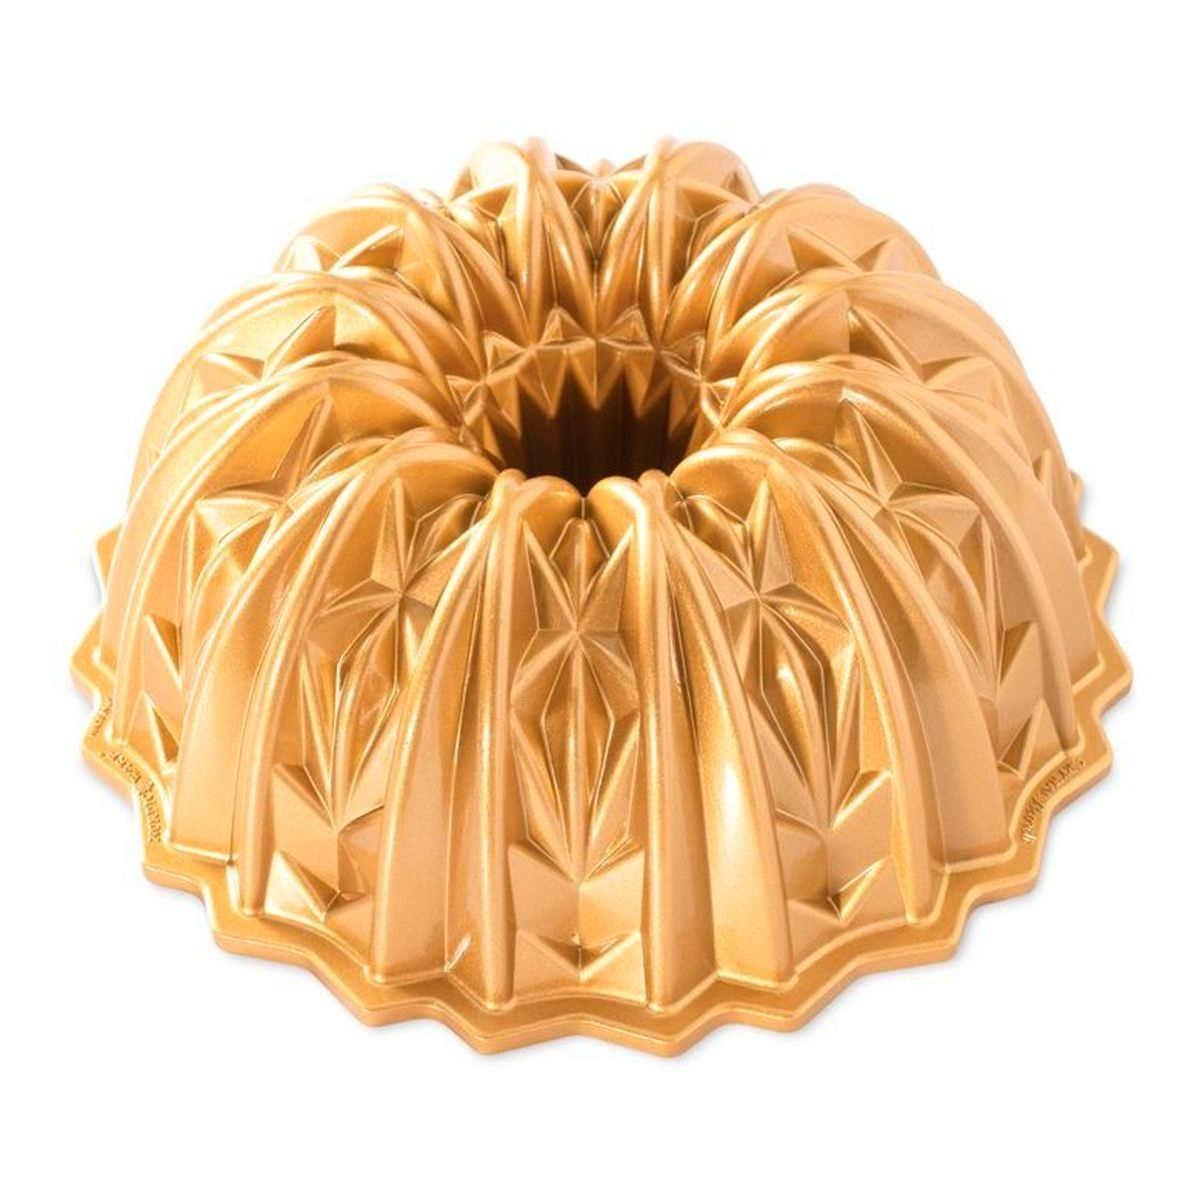 Moule crystal bundt pan en fonte d´aluminium - Nordic Ware